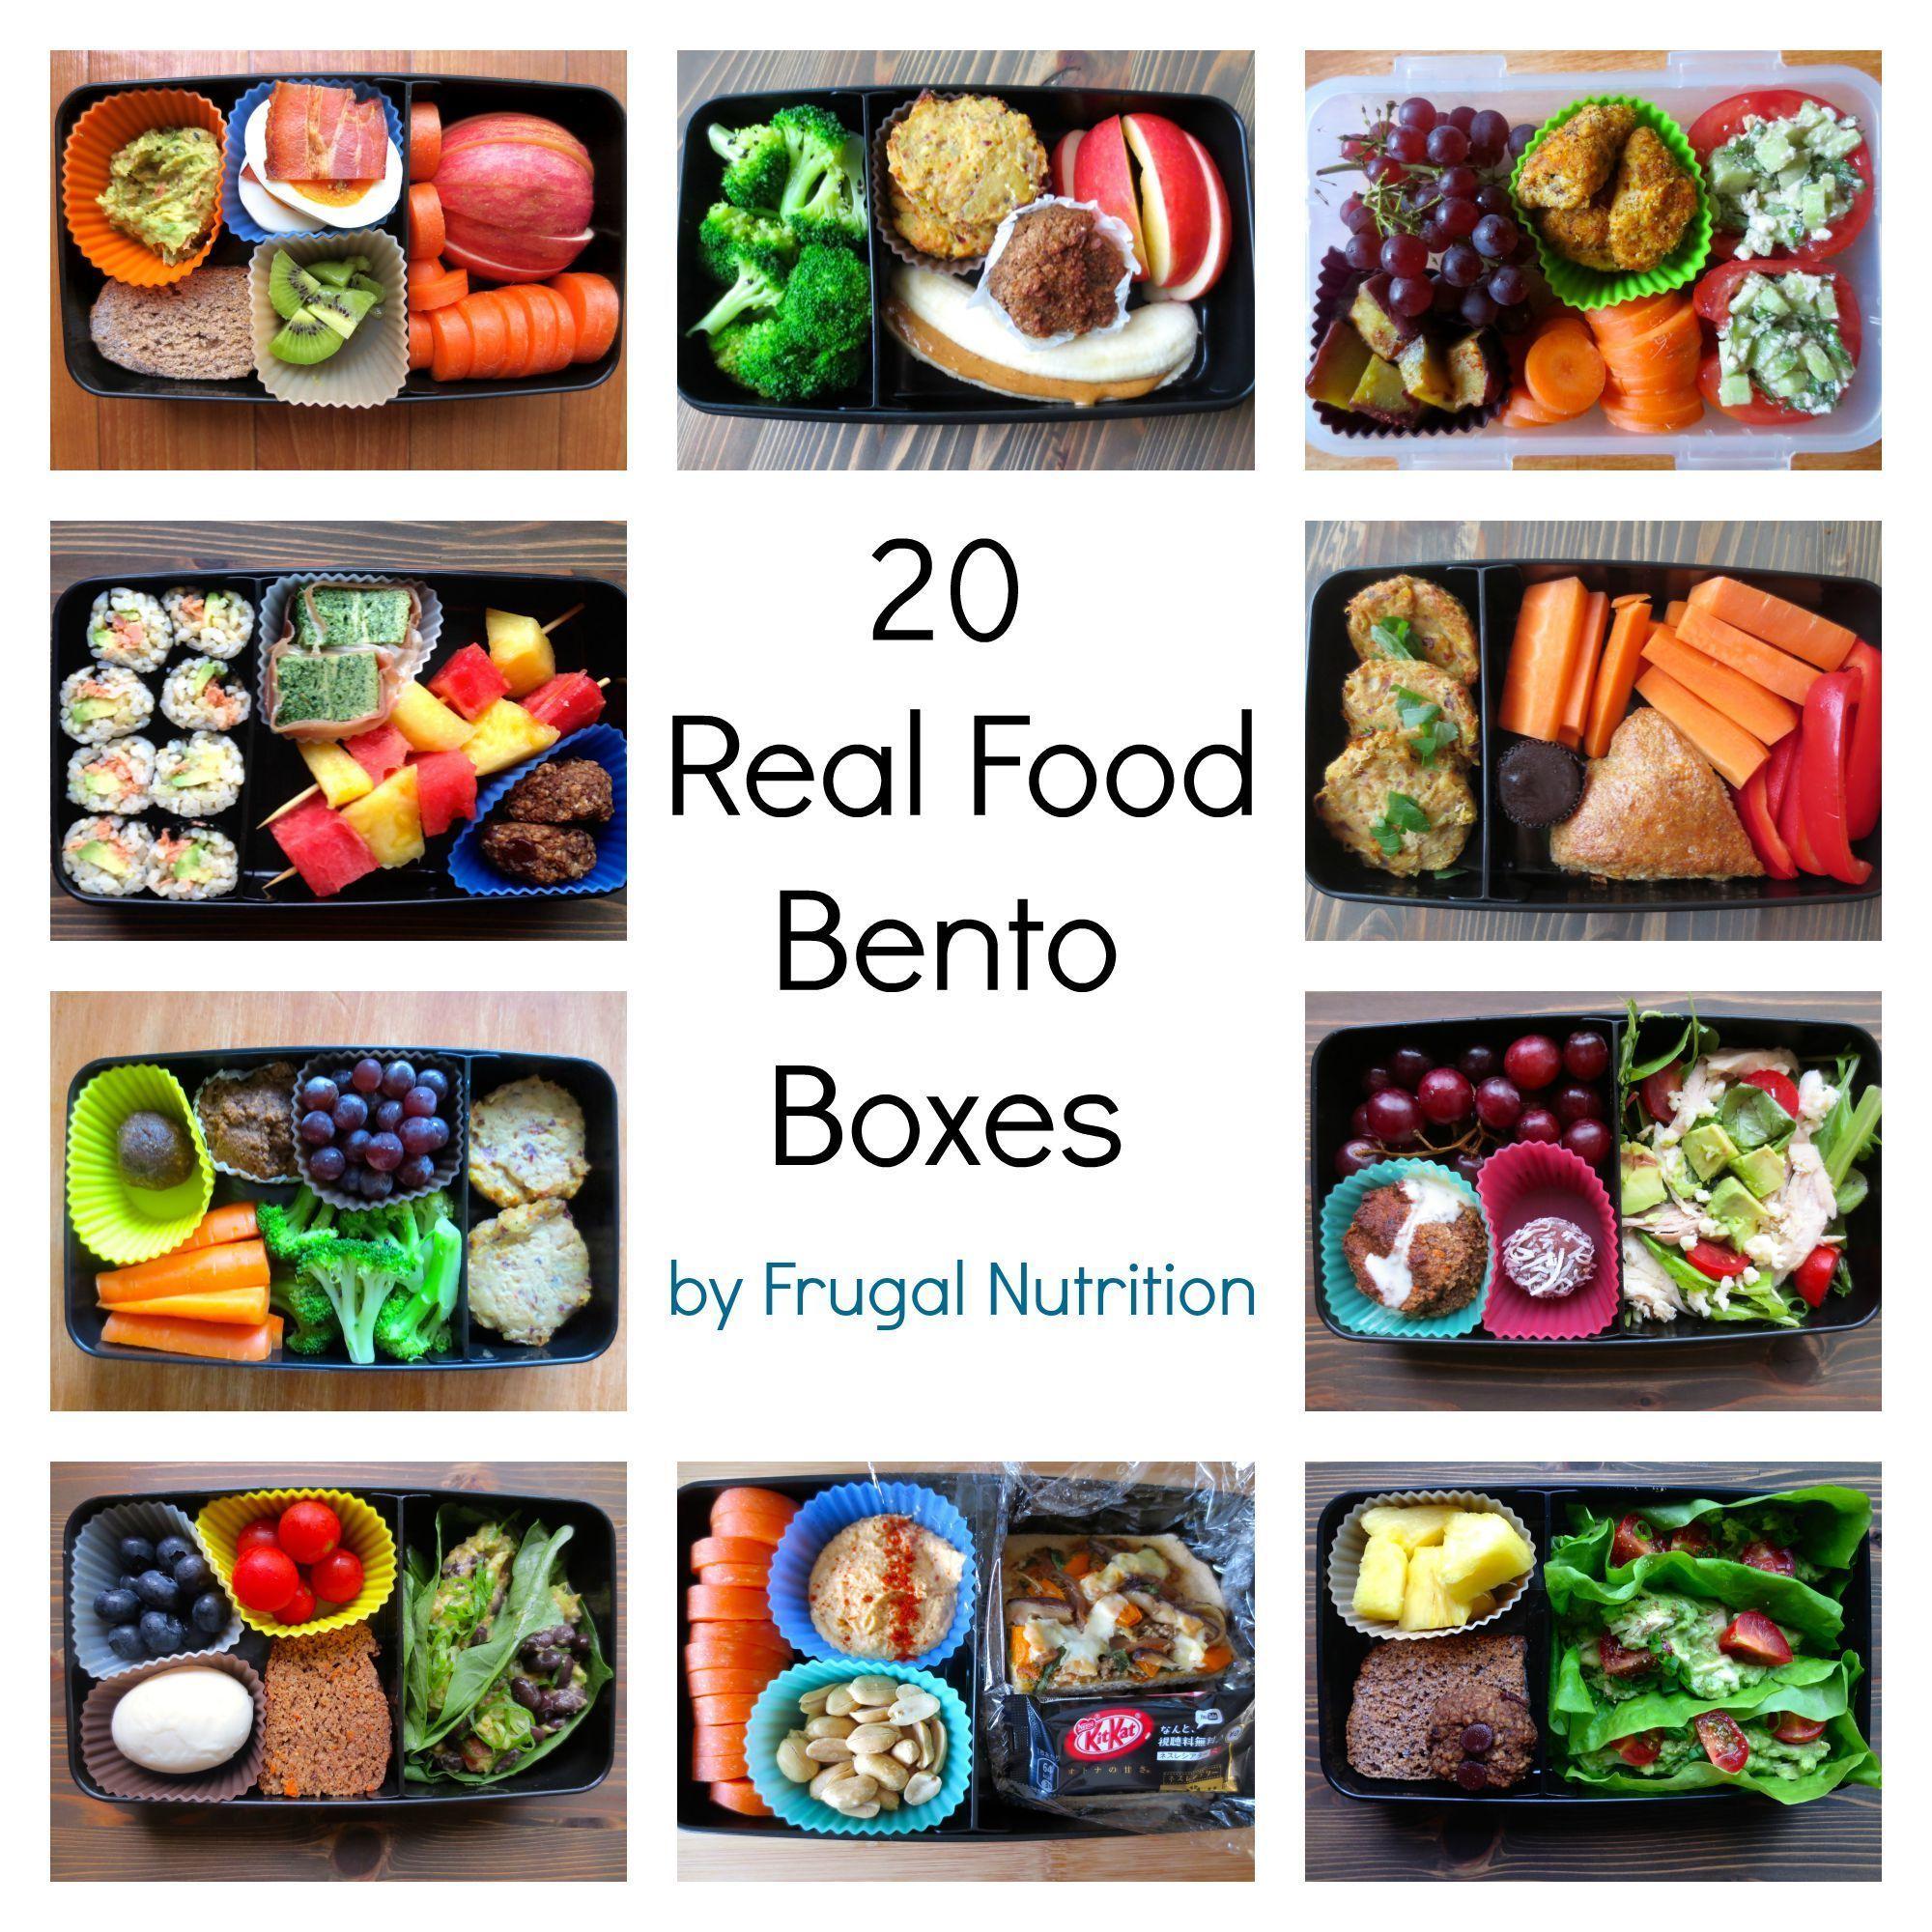 Real Food Bento Box Round Up: 20 Lunch Box Ideas #bentoboxlunch